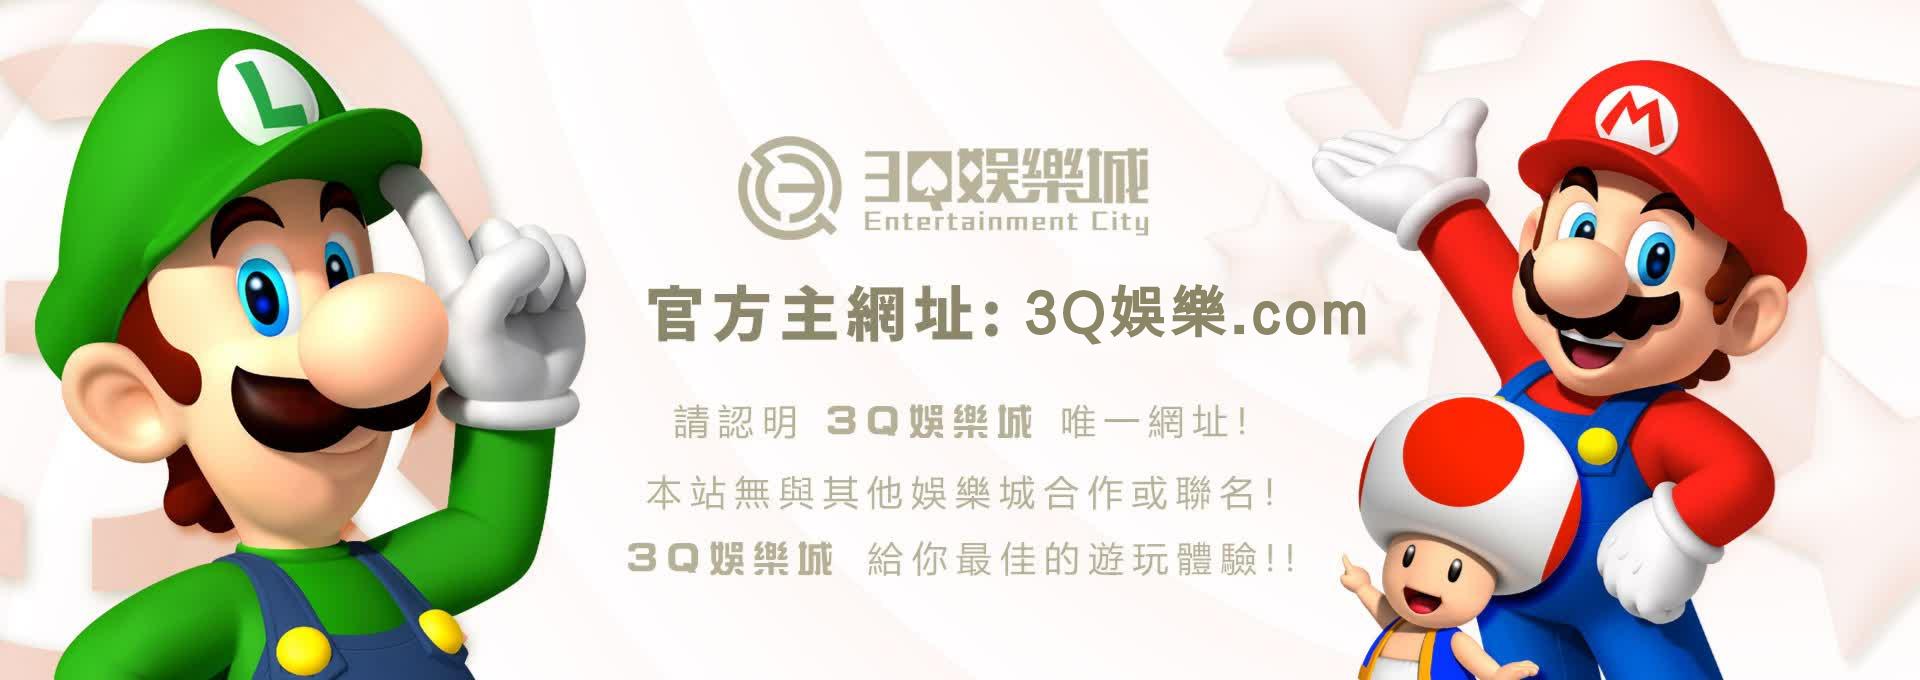 3Q娛樂城 – 官方網站 2022最新娛樂城 運彩安全快速下分